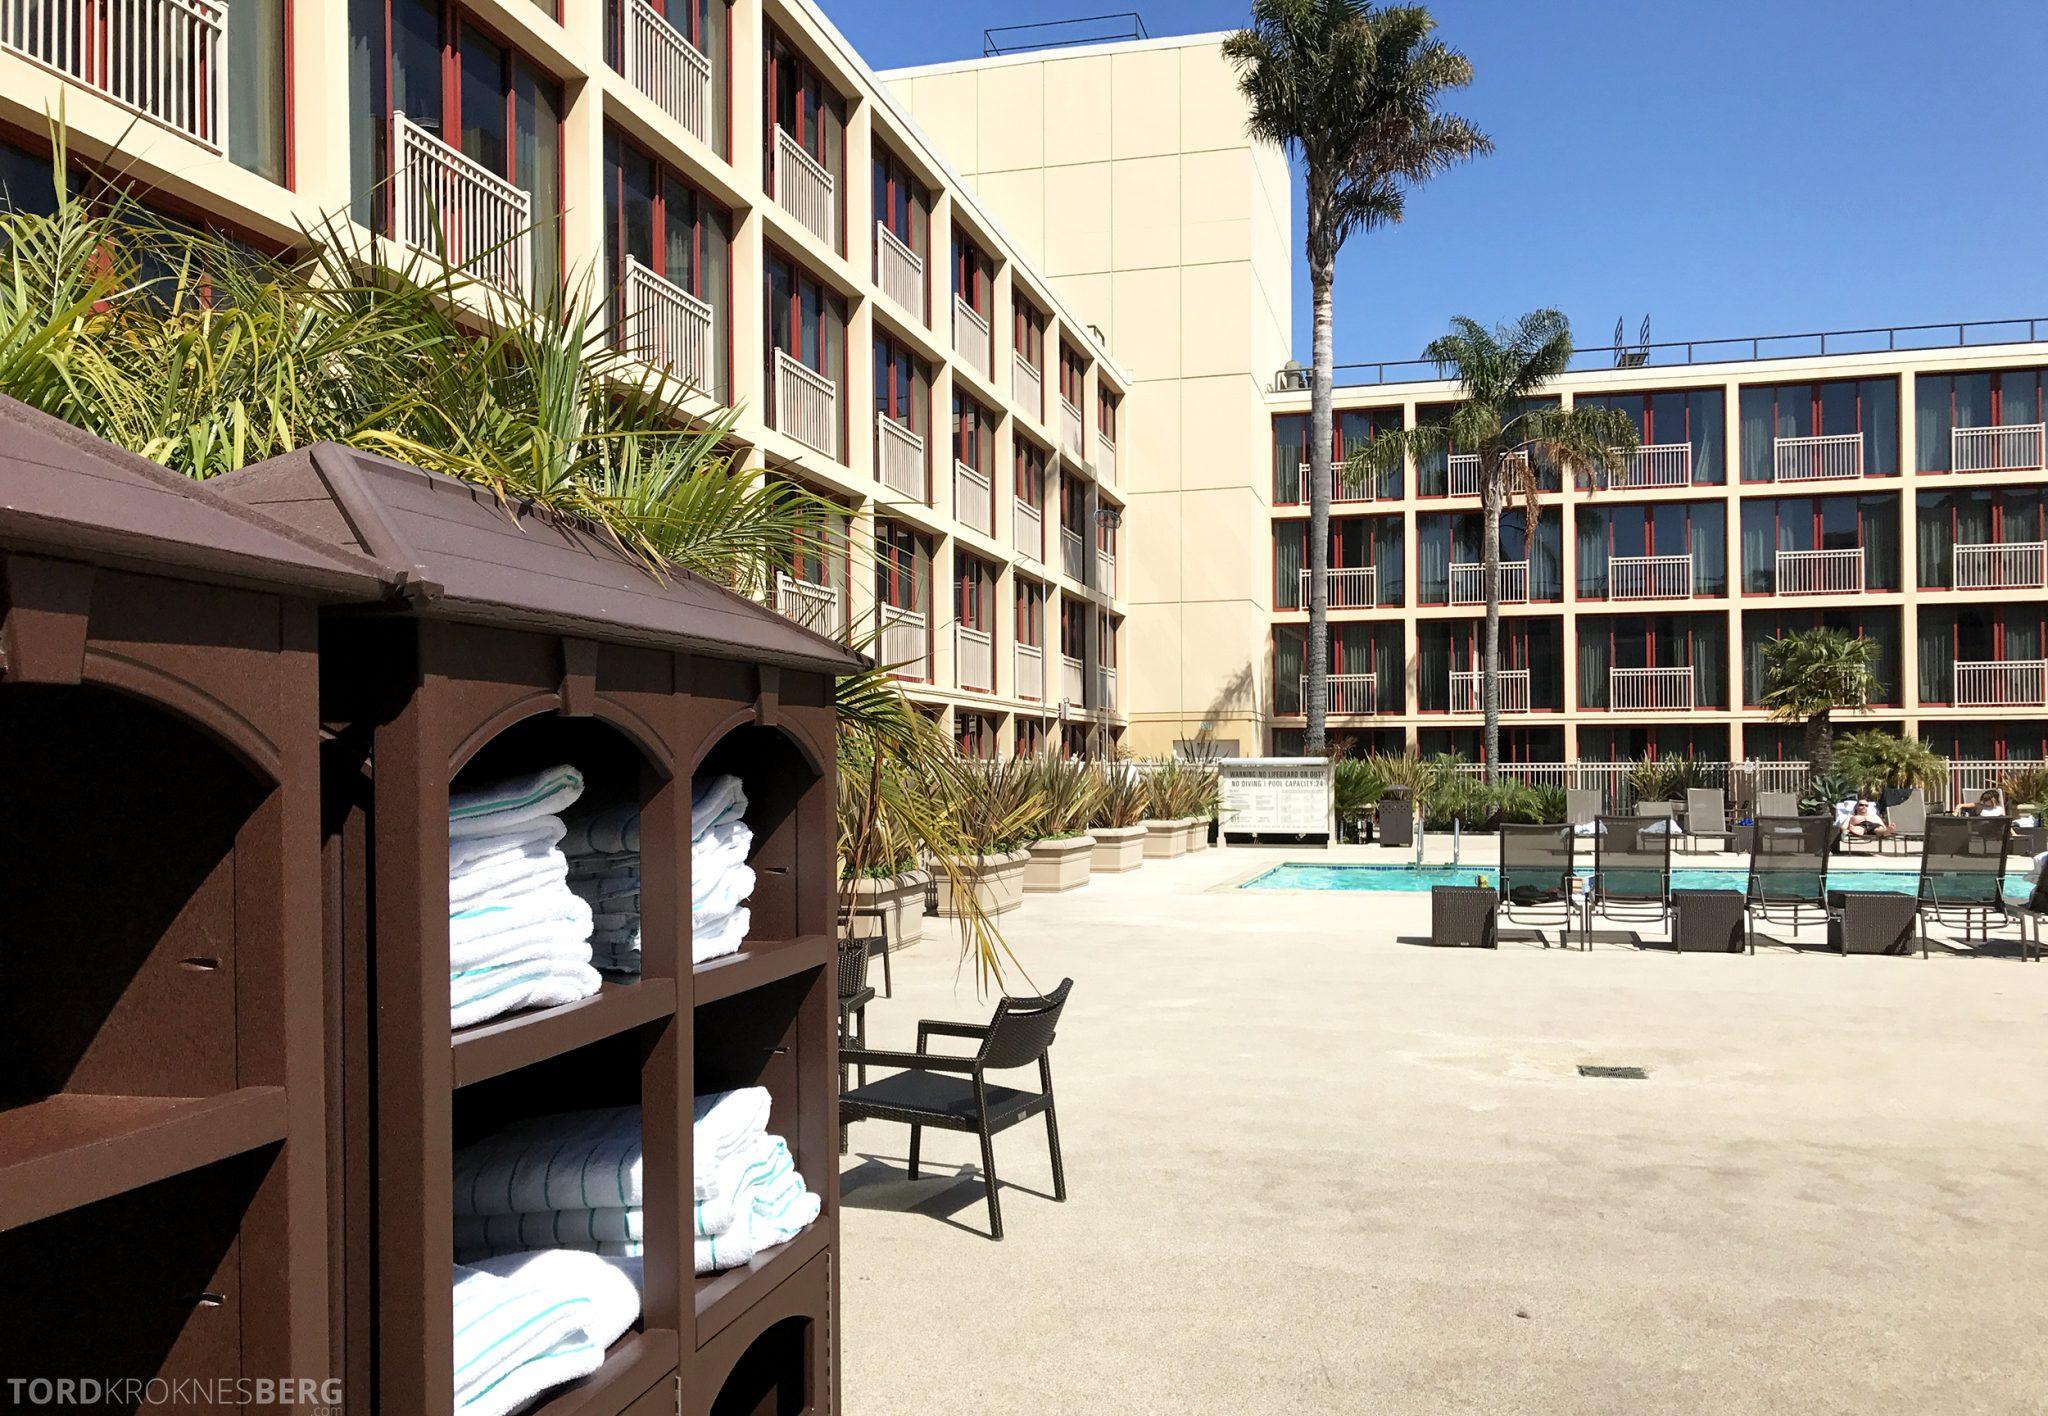 Hilton San Francisco Hotel basseng